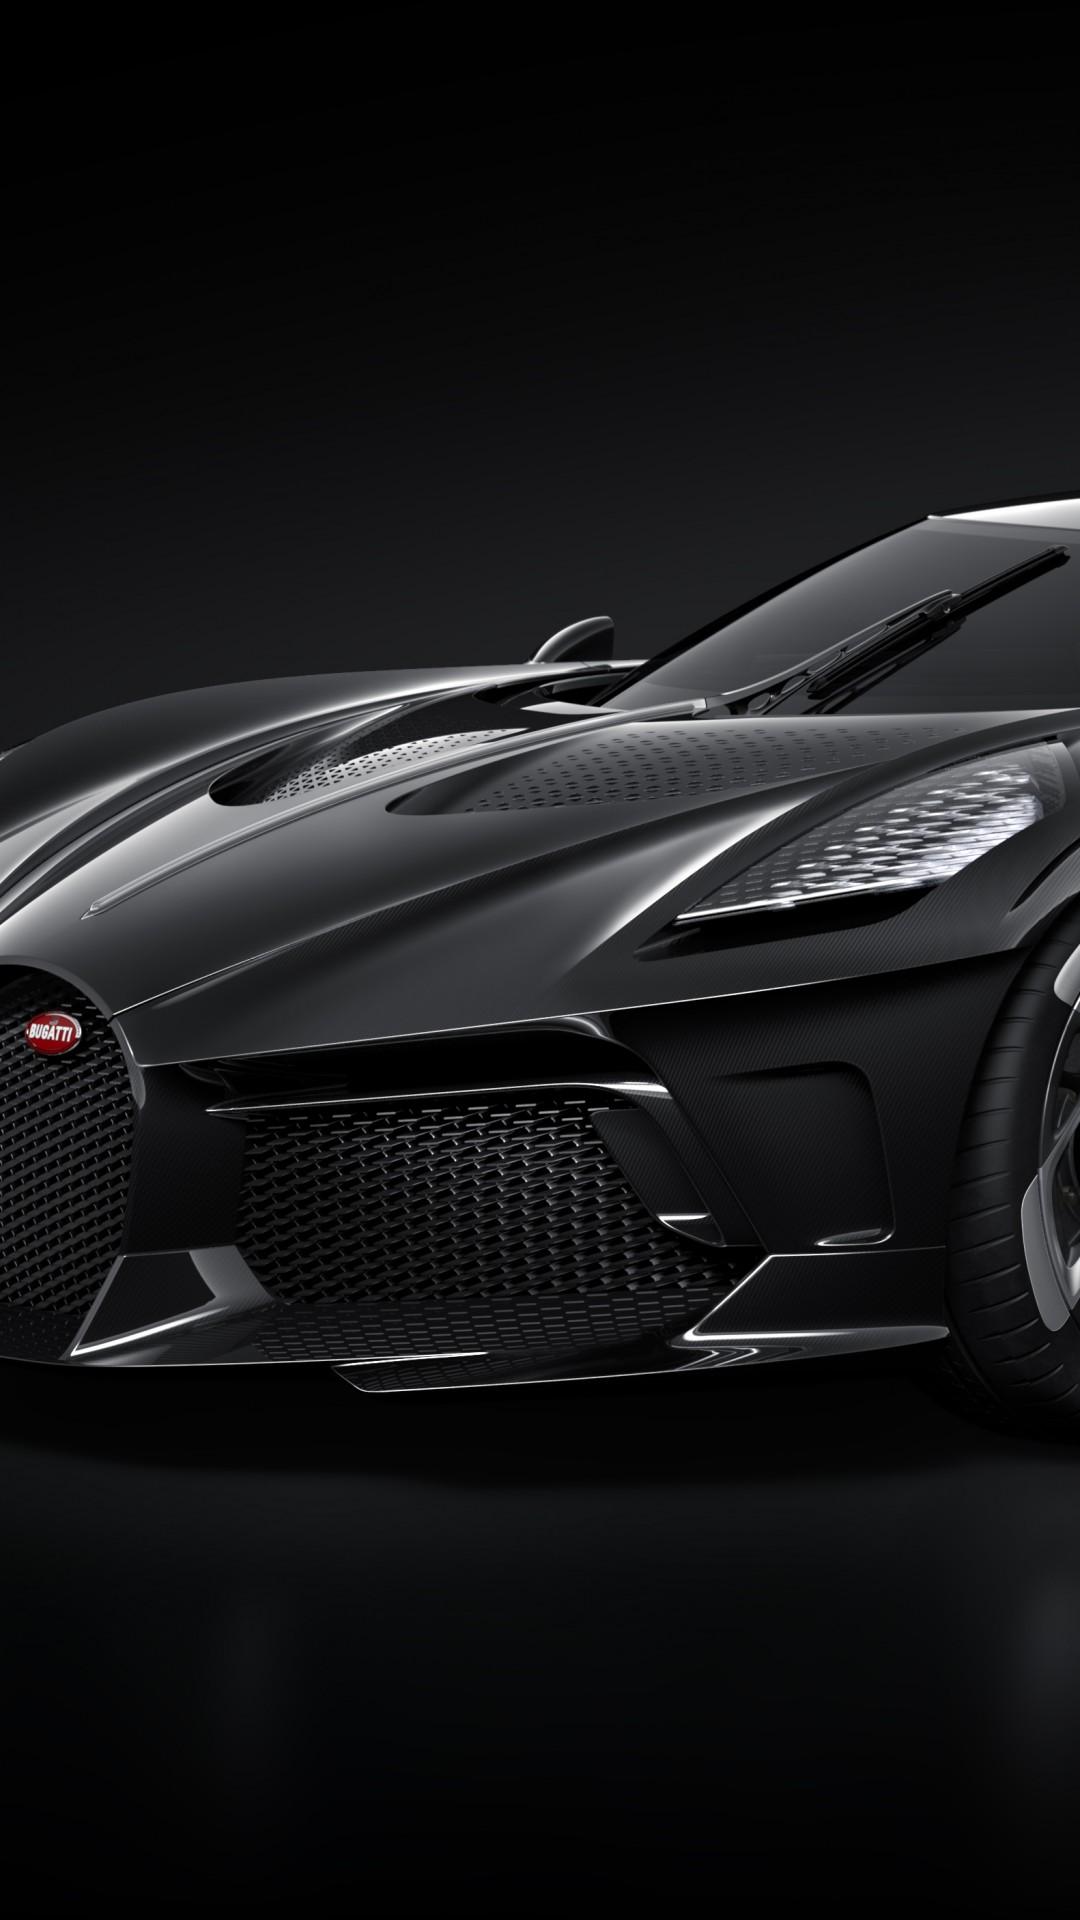 Wallpaper Bugatti La Voiture Noire Geneva Motor Show 2019